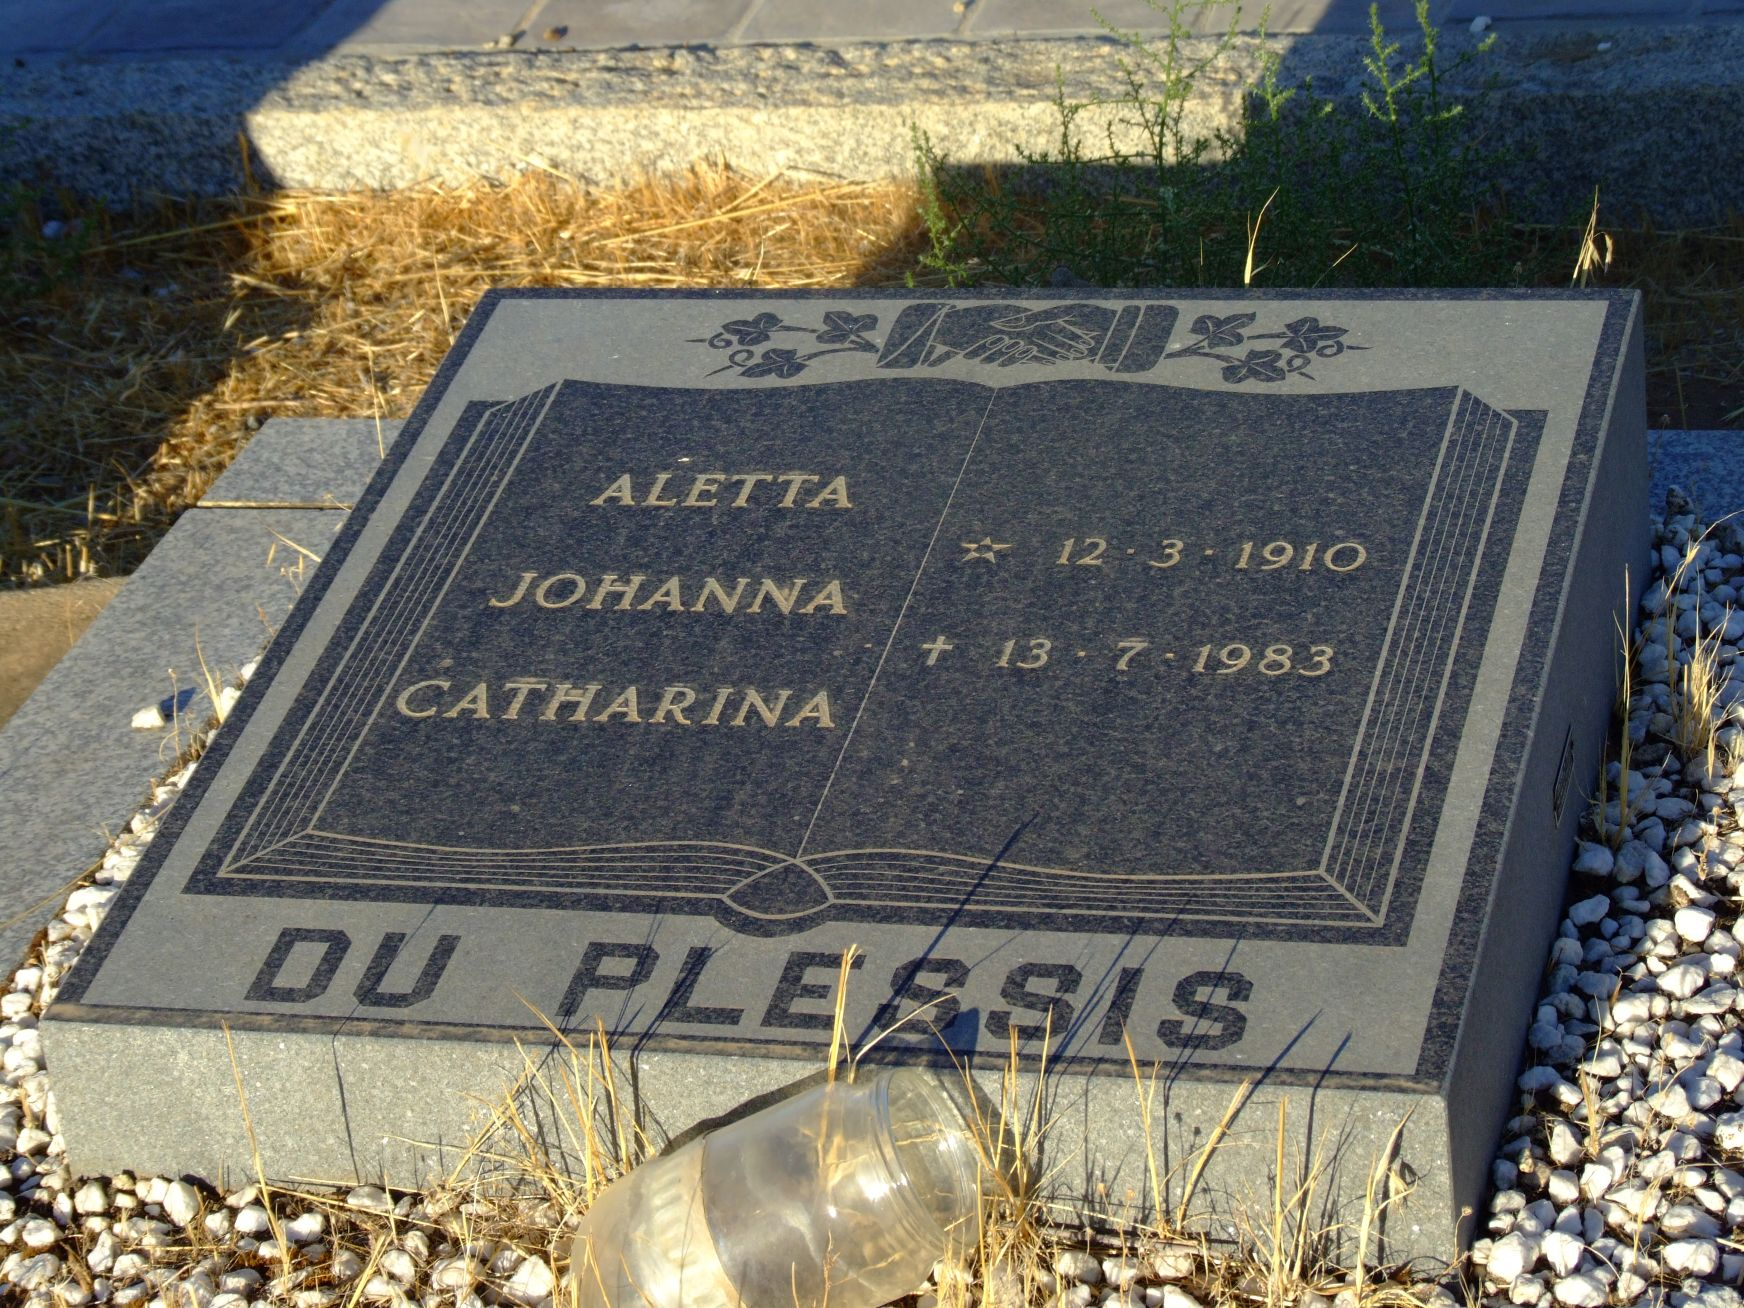 Du Plessis, Aletta Johanna Catharina